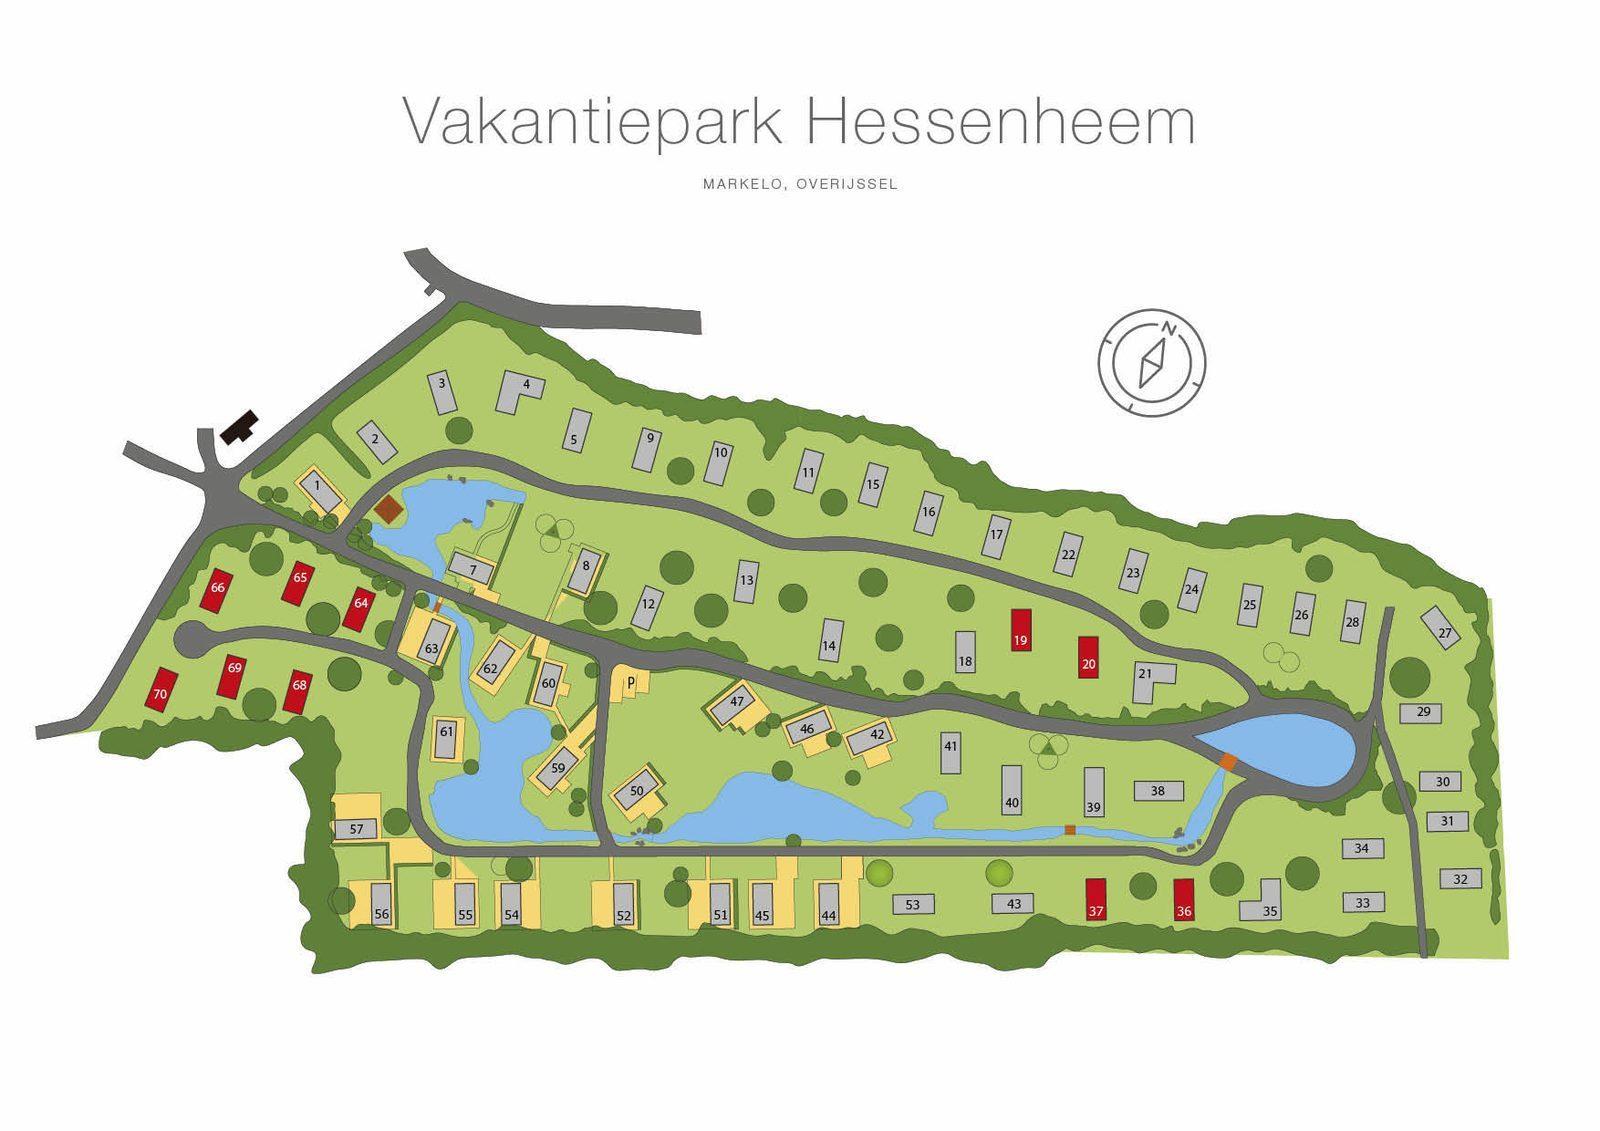 2018_Parkplattegrond_verhuur_-_Vakantiepark_Hessenheem.jpg